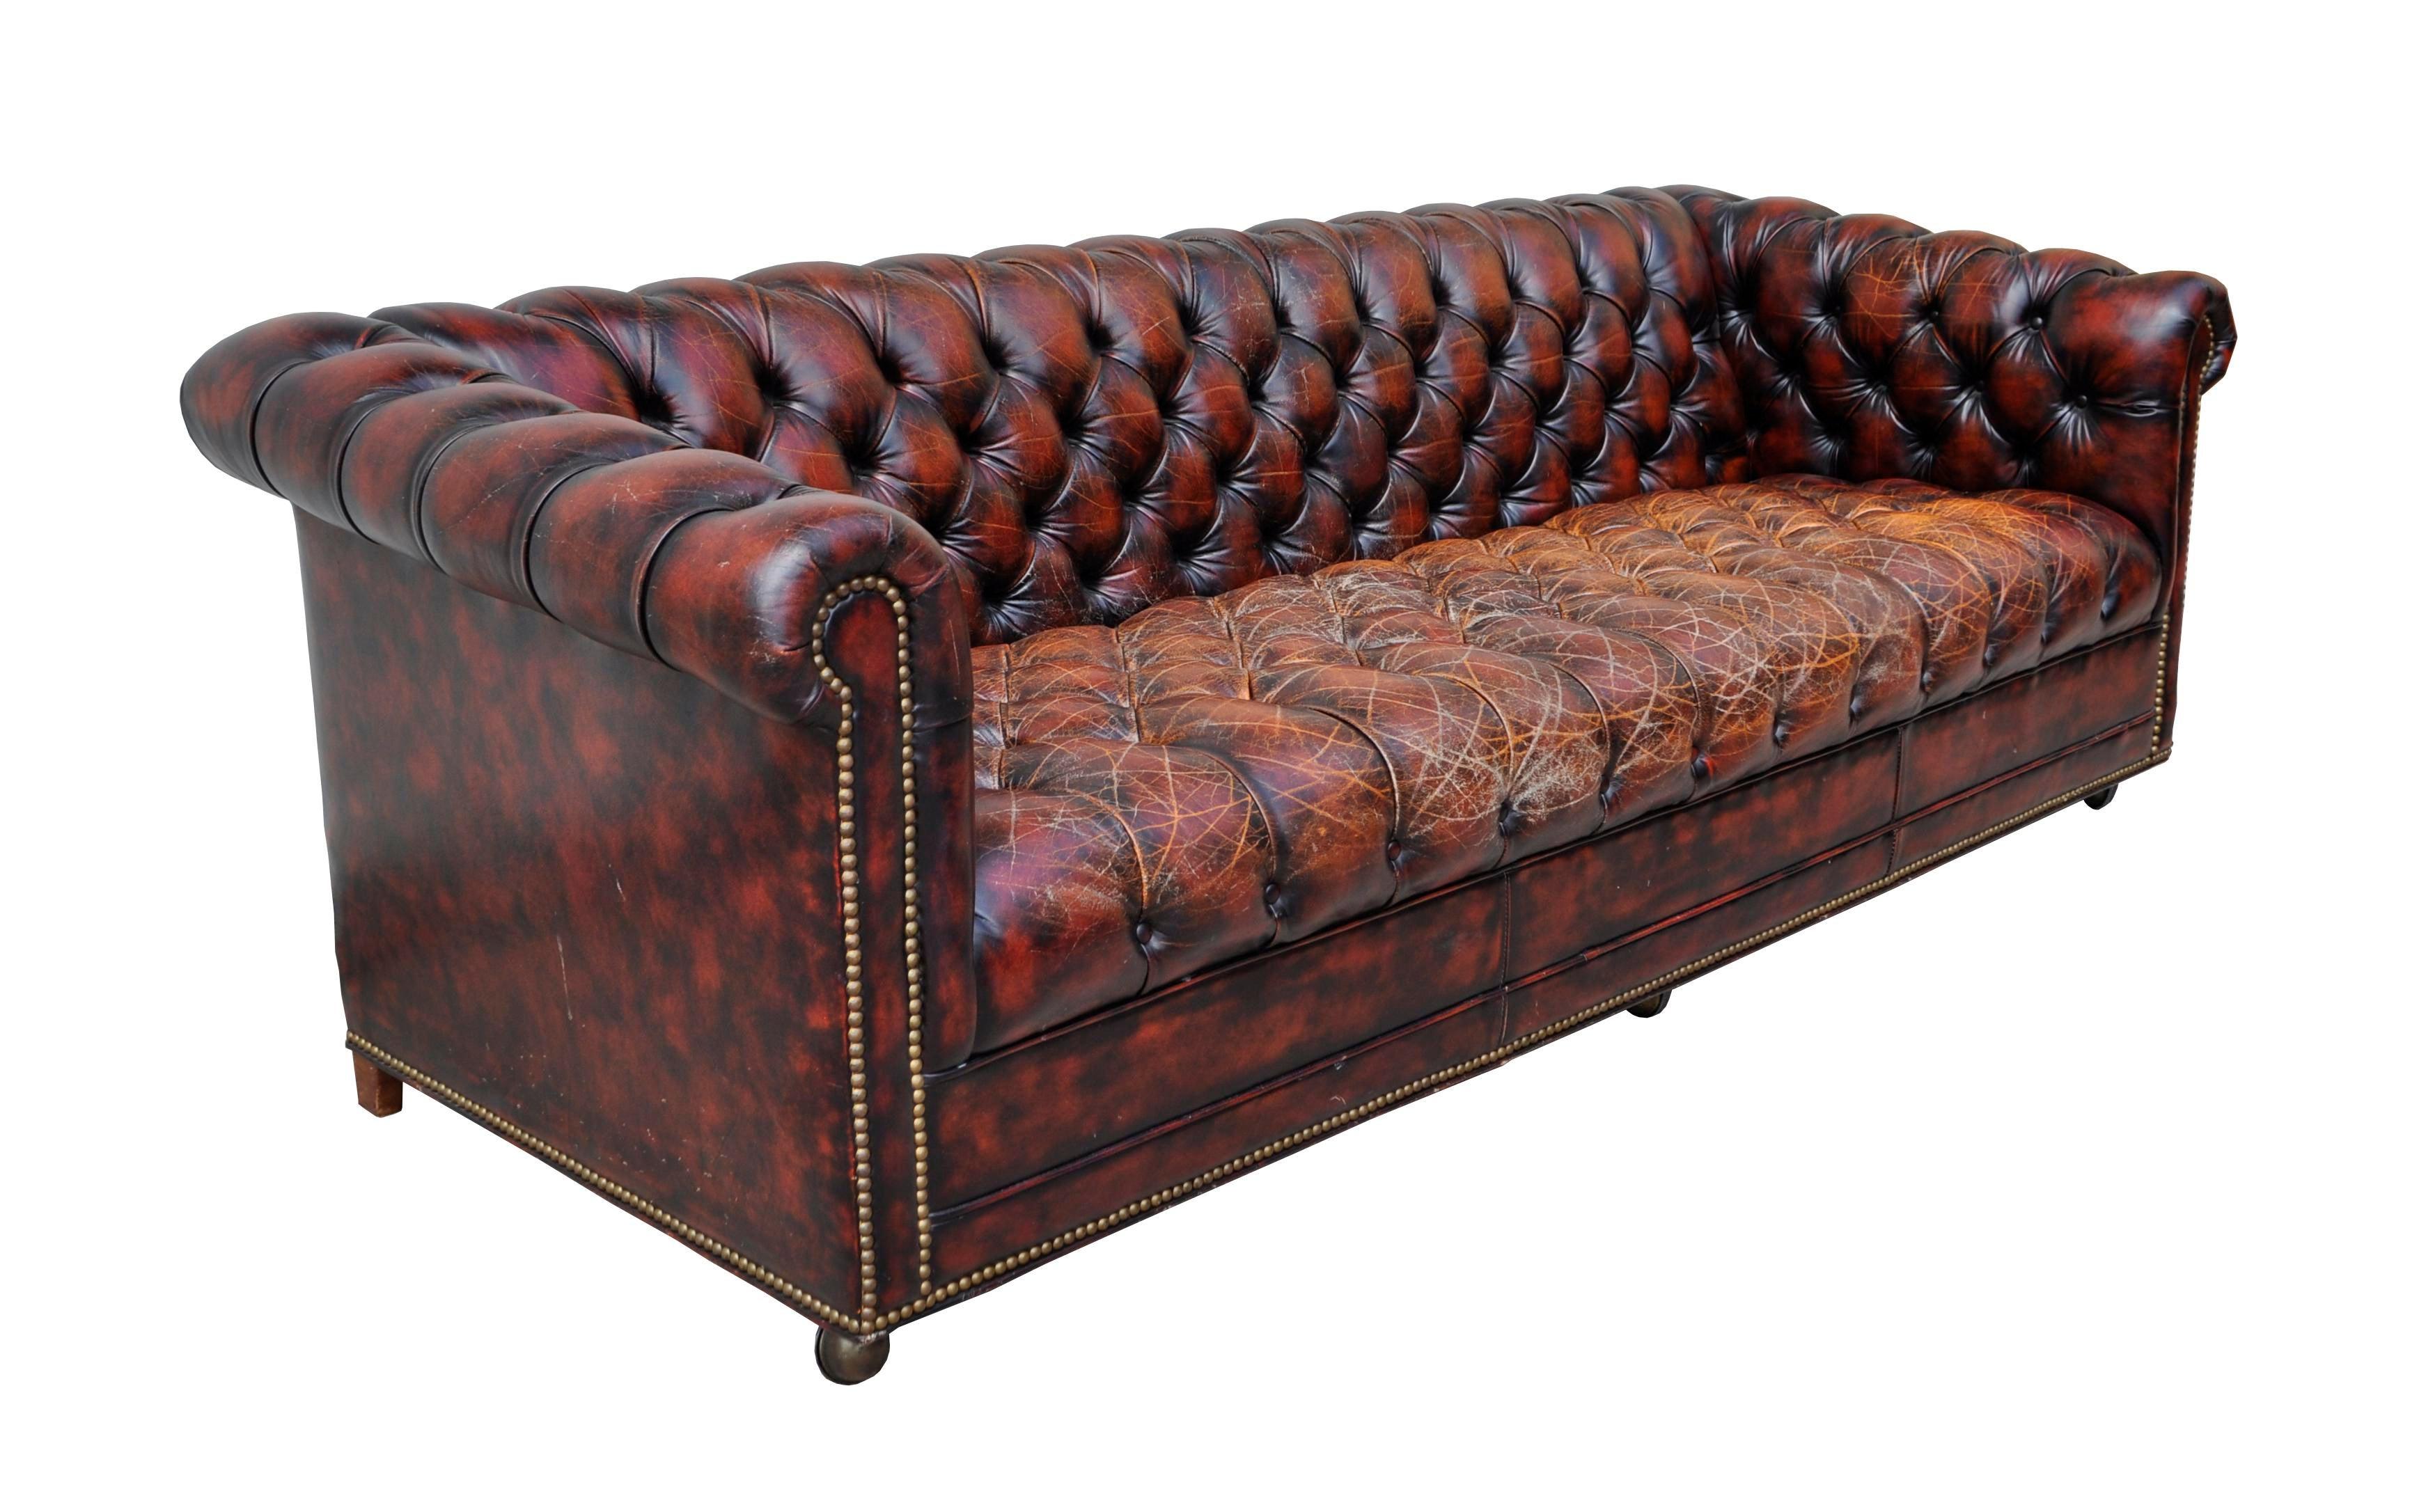 1940s Original English Oxblood Chesterfield Sofa Chairish